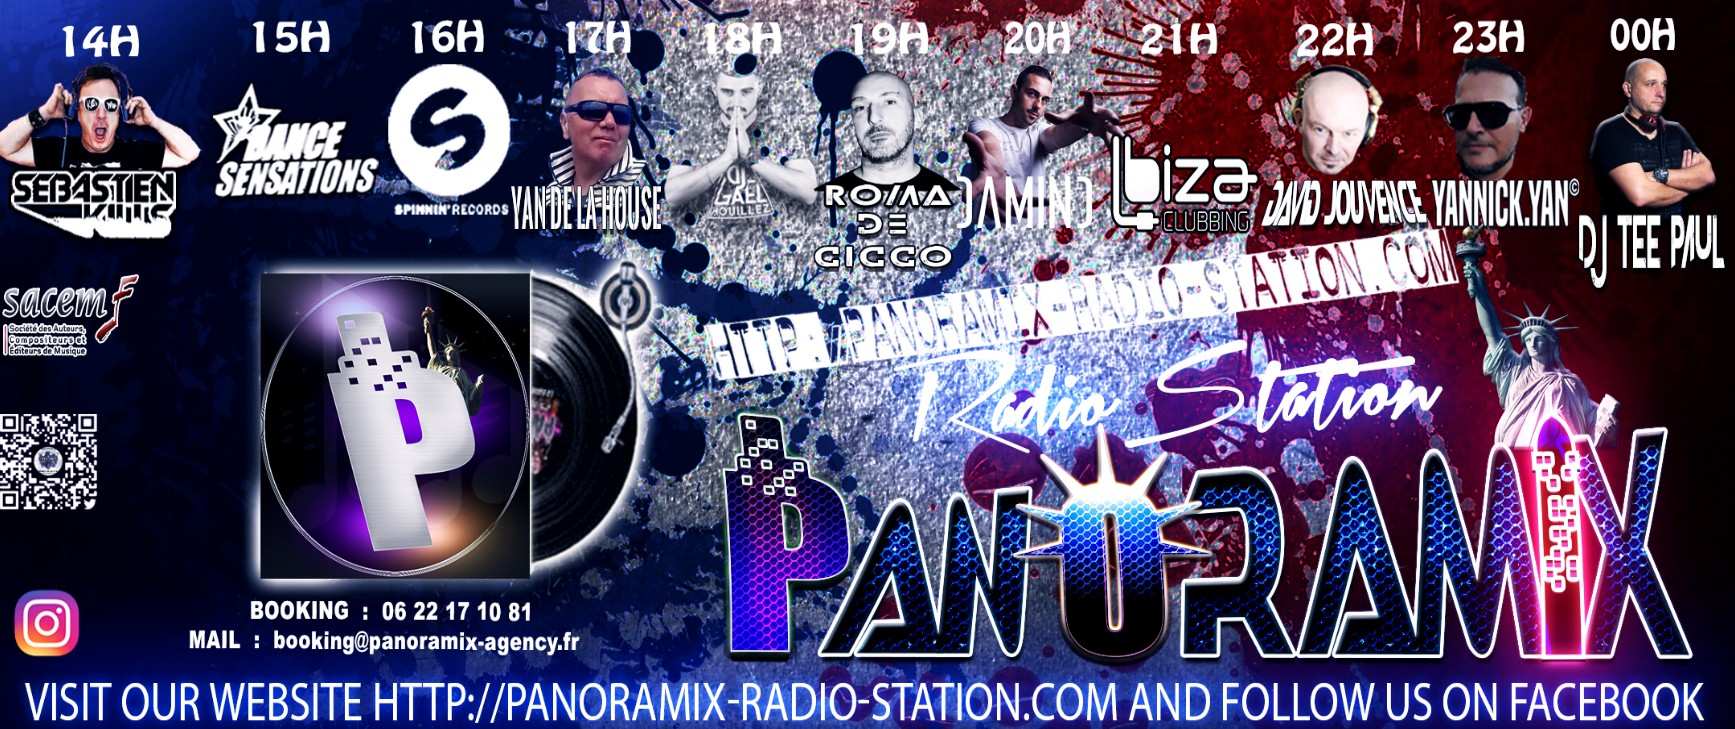 http://panoramix-radio-station.com/wp-content/uploads/2018/07/12773219_824252517700952_1840457403_o.jpg